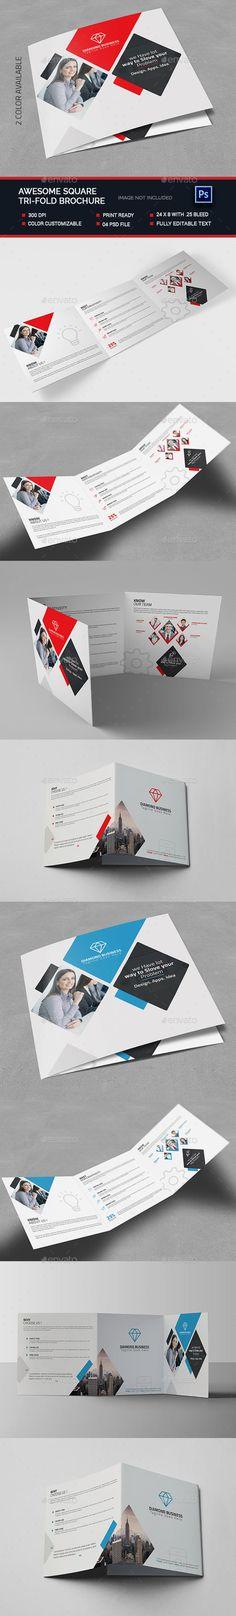 Awesome Square Tri-fold Brochure